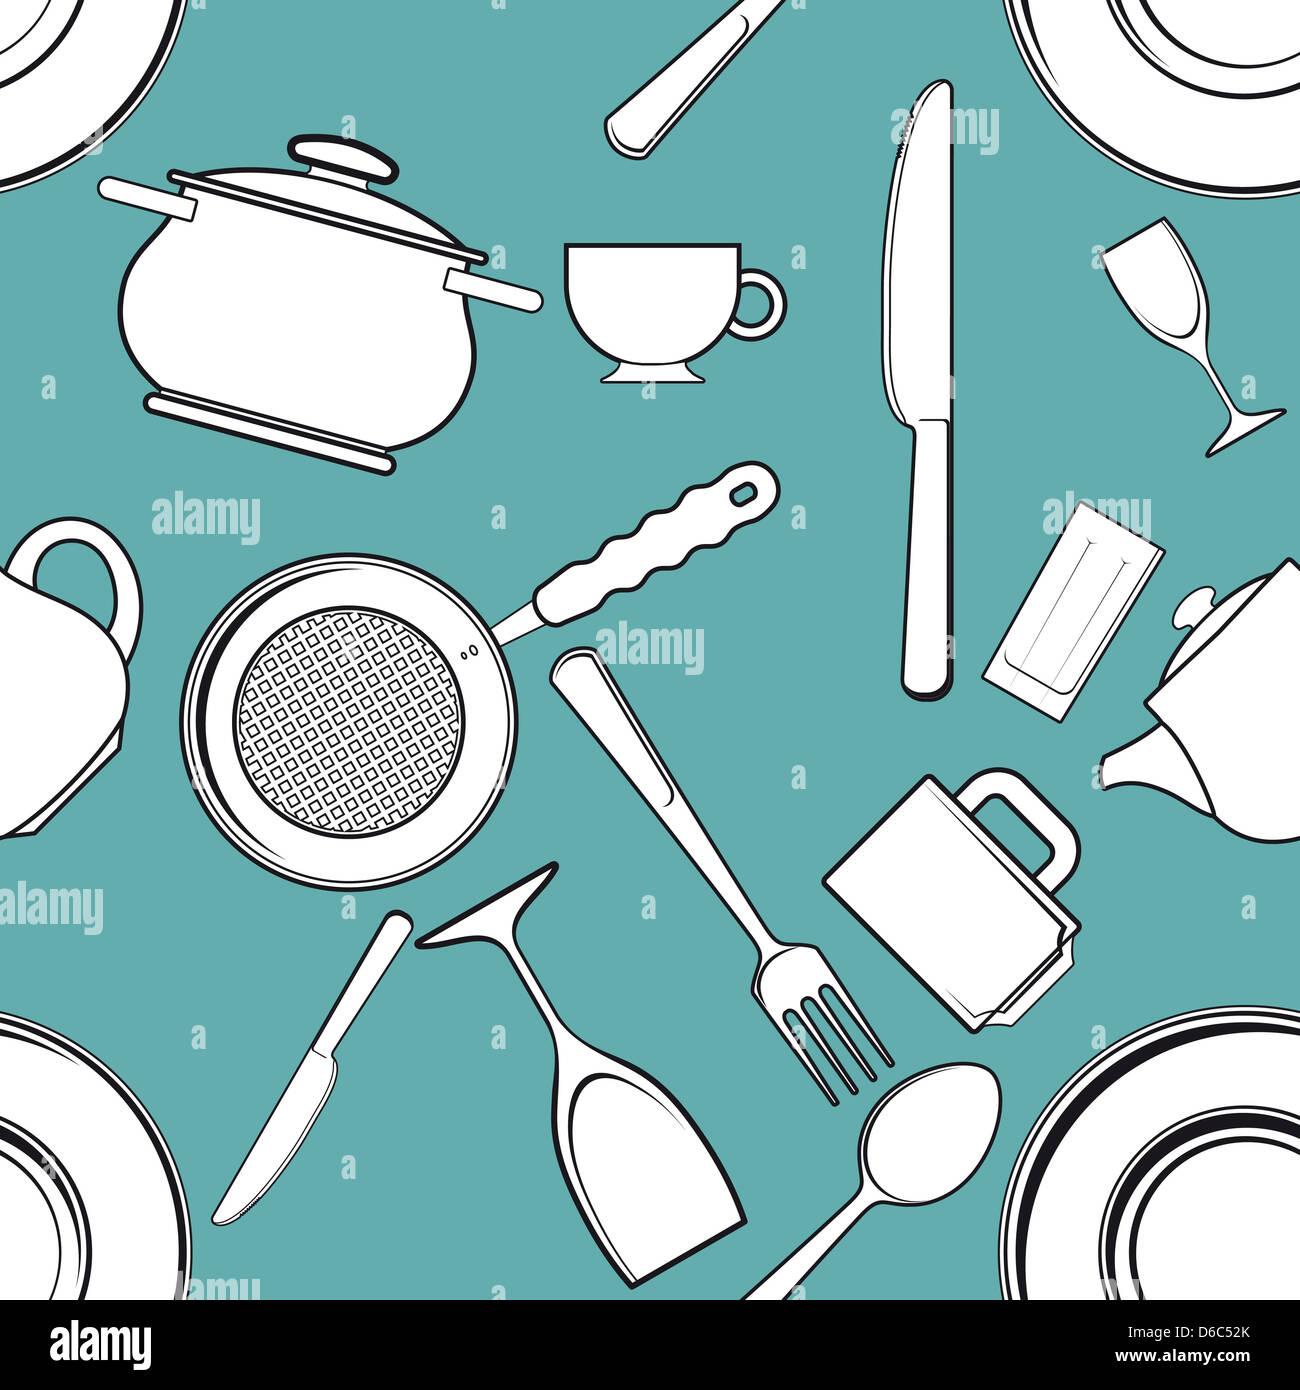 Kitchen Utensils Outline Seamless Pattern Stock Photos & Kitchen ...